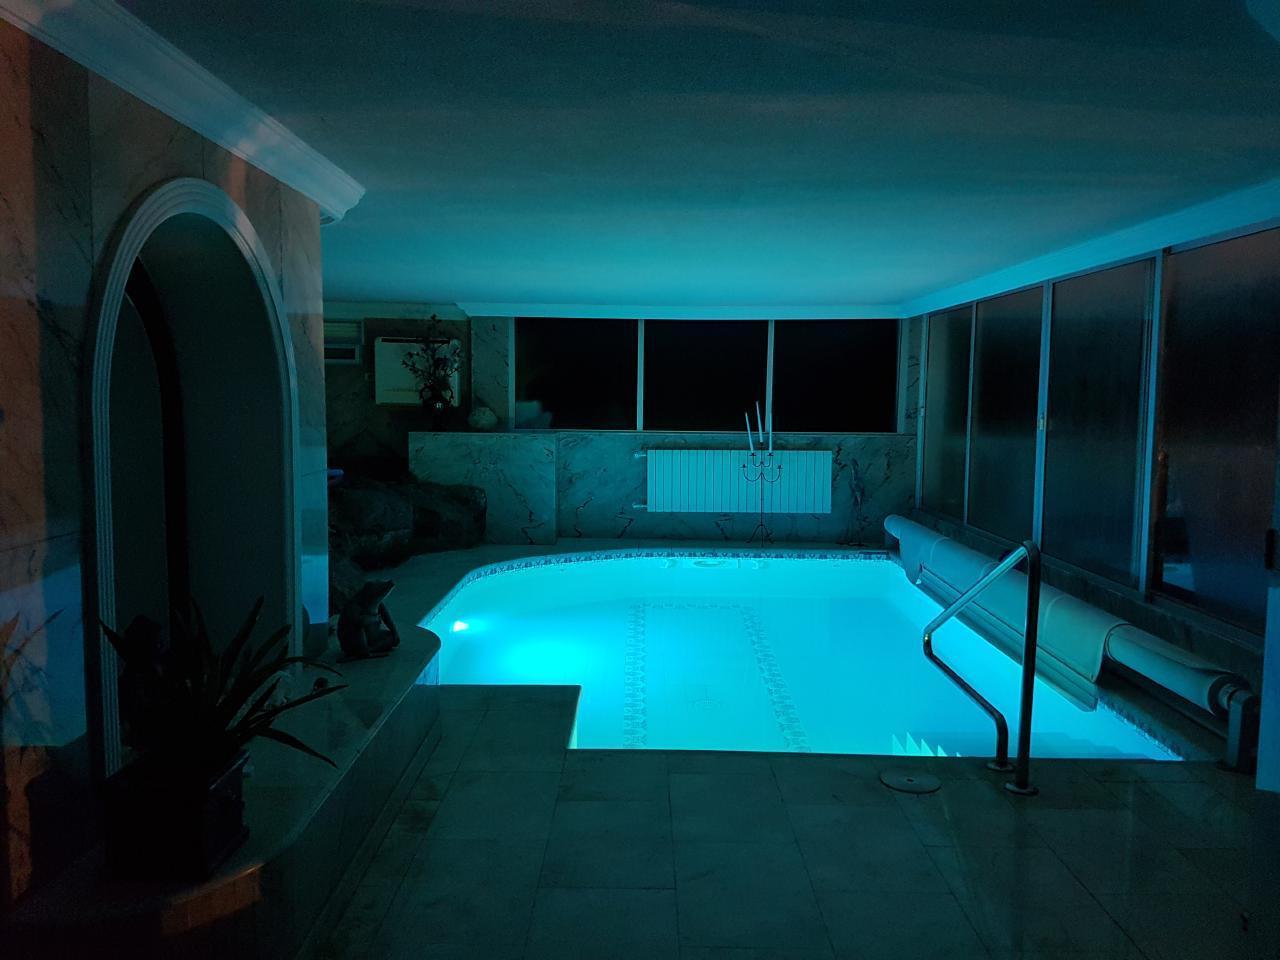 Appartement de vacances Villa Larnia Familien Apartment   * Urlaub für Körper, Geist und Seele * (2529406), El Sauzal, Ténérife, Iles Canaries, Espagne, image 36